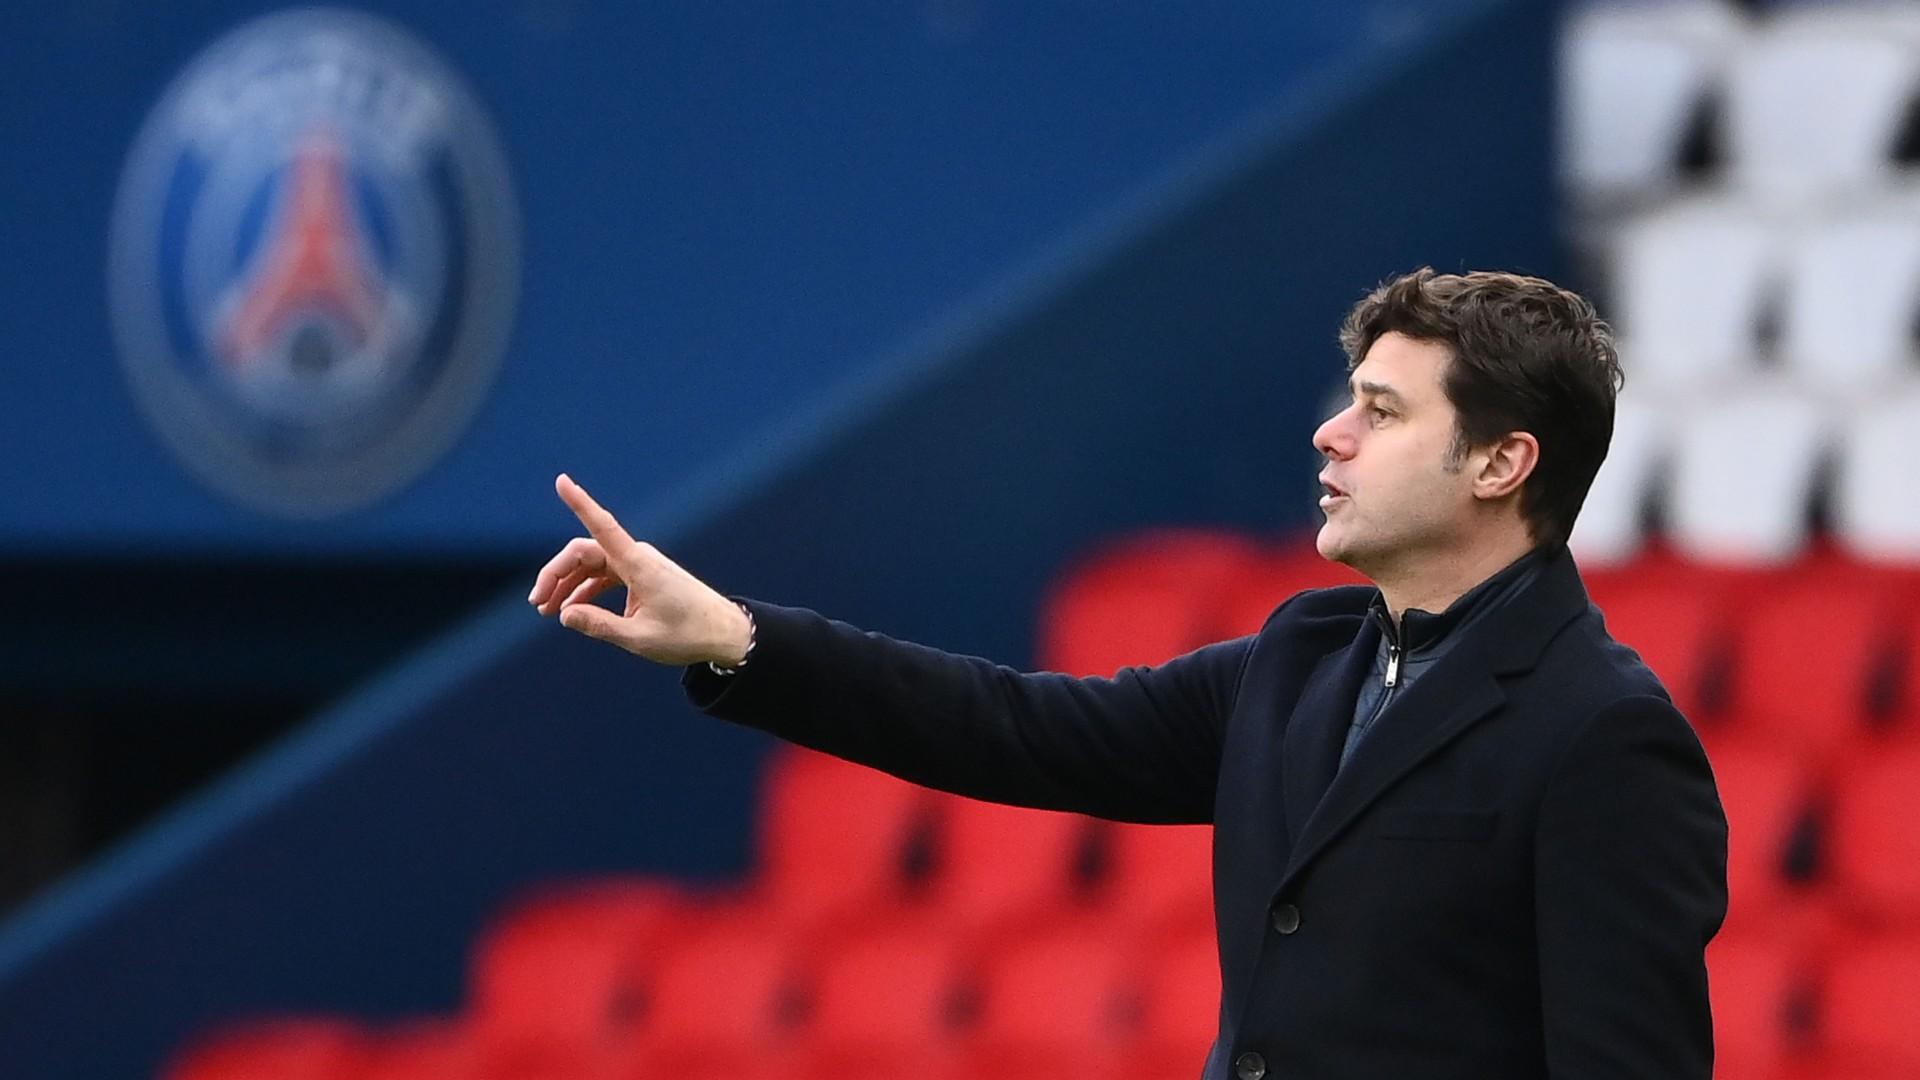 PSG will be ready for Champions League showdown against Barca – Pochettino